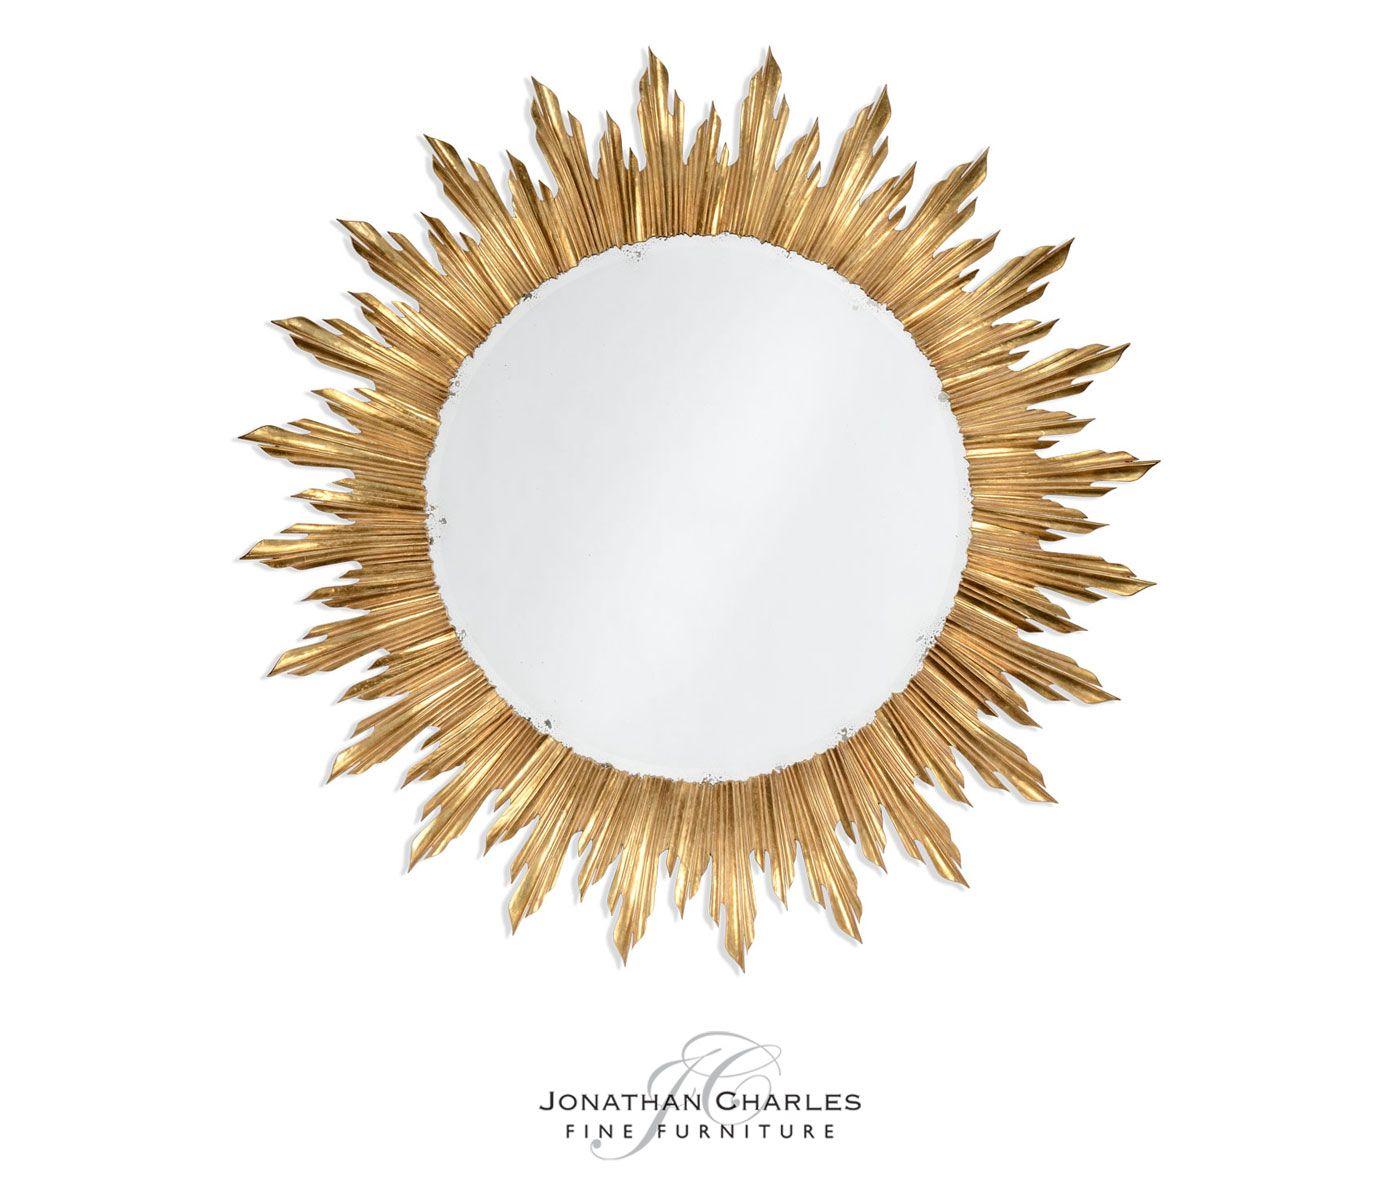 Large gilt sunburst mirror #hpmkt #jcfurniture #jonathancharles #Furniture #InteriorDesign #decorex #versailles